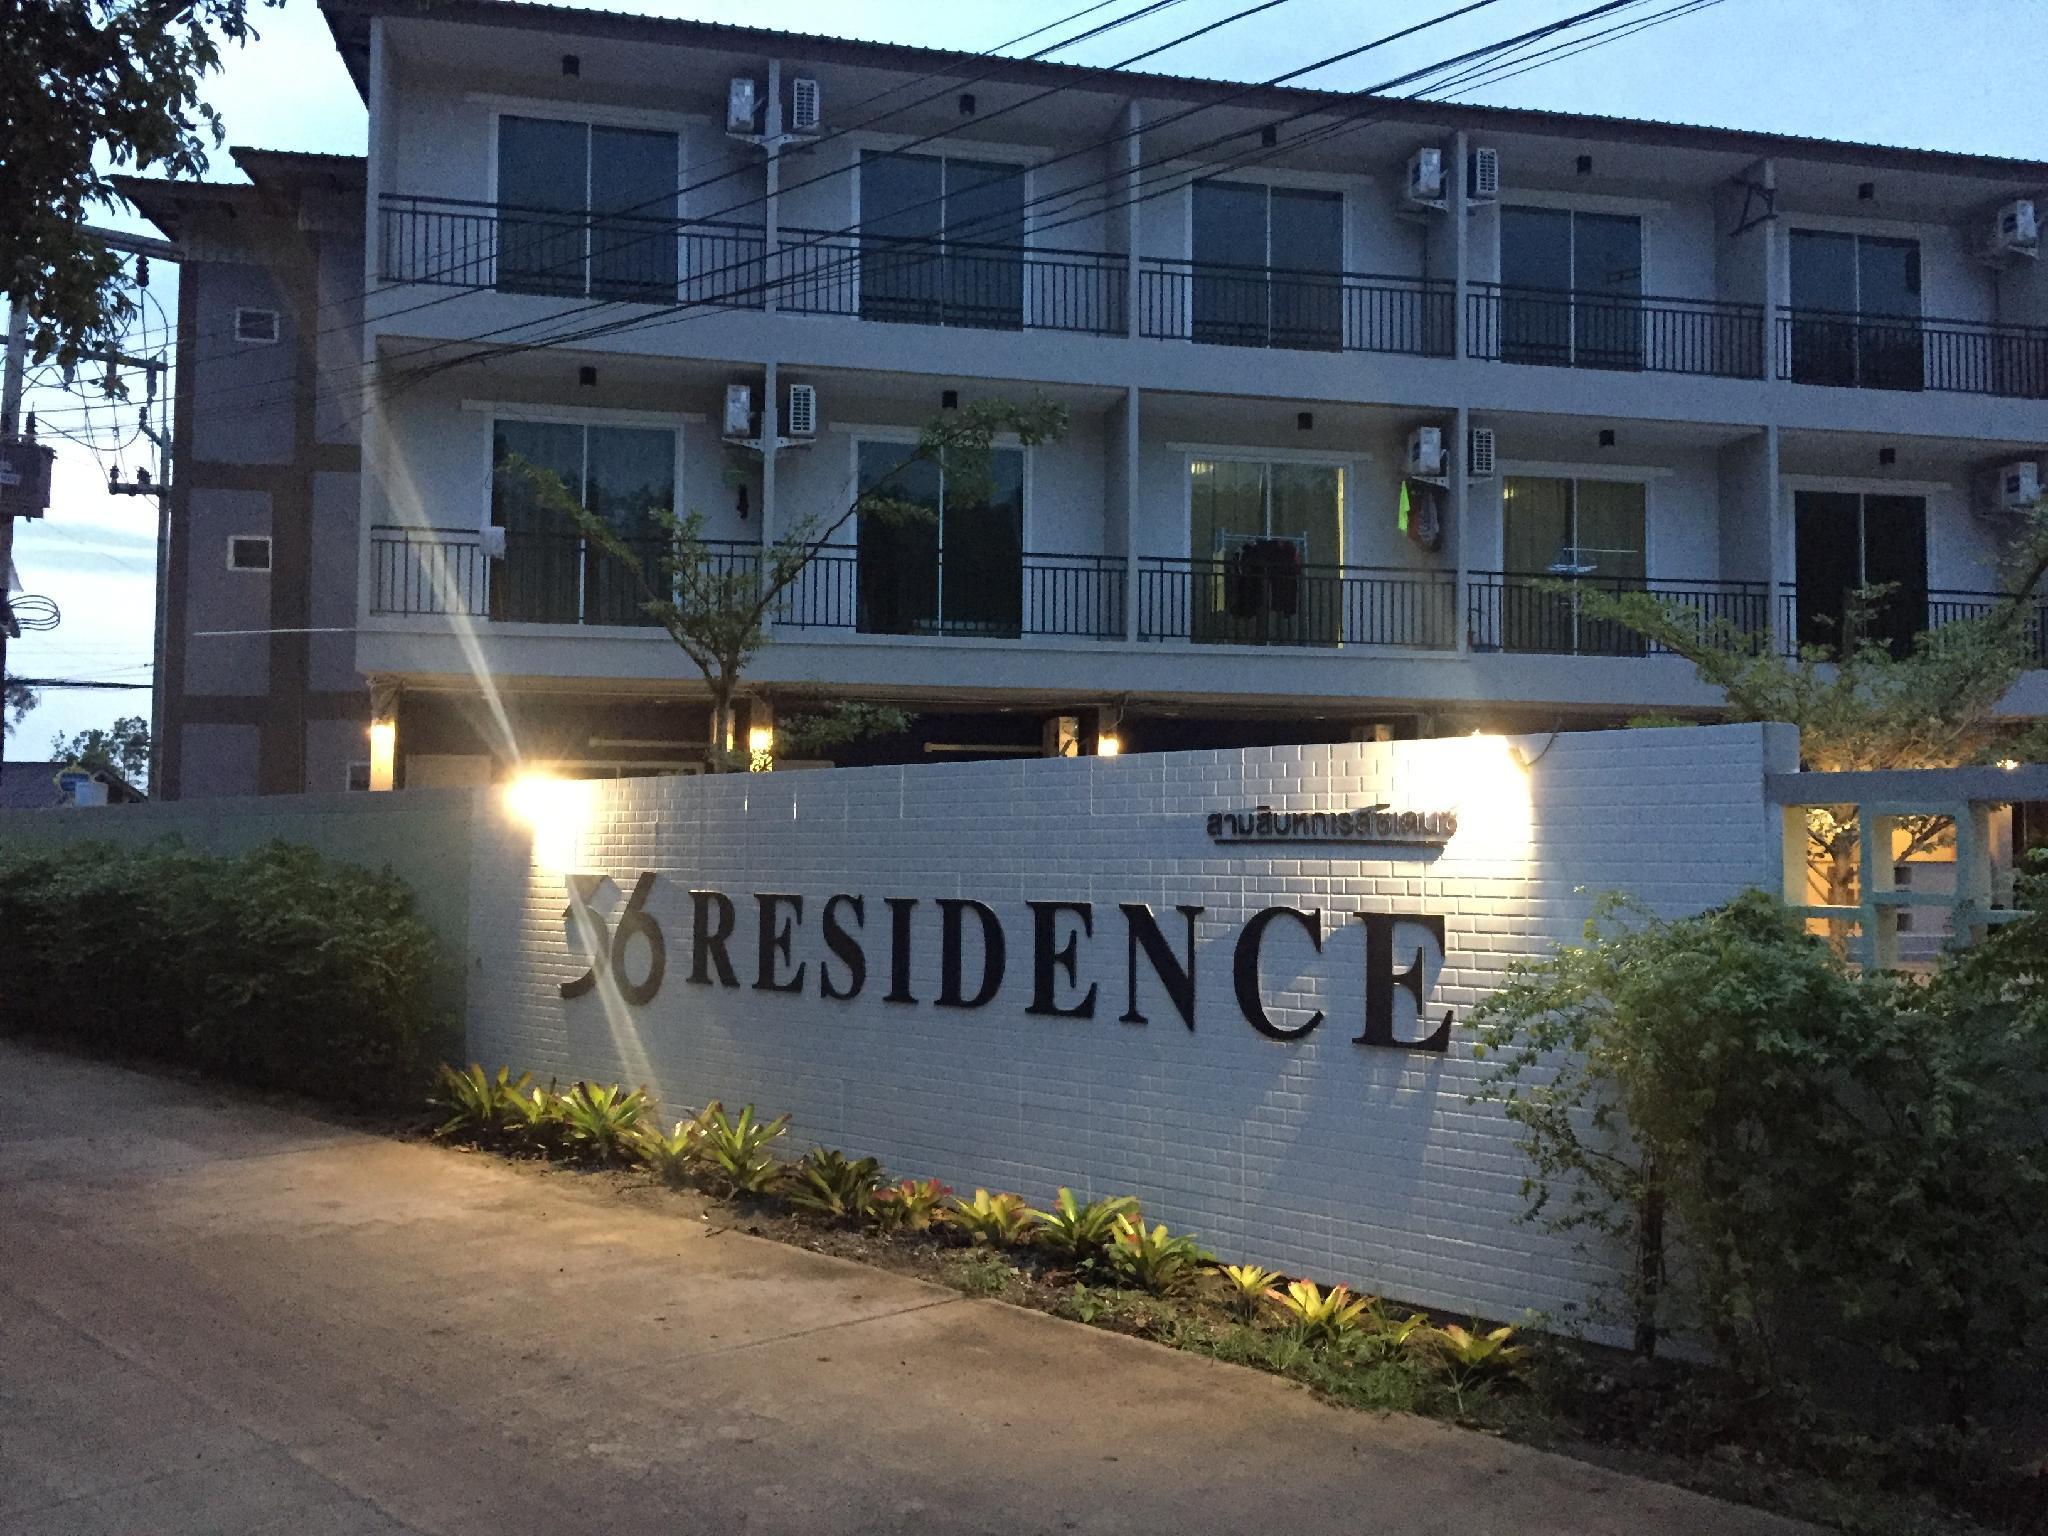 36 Residence Rayong.